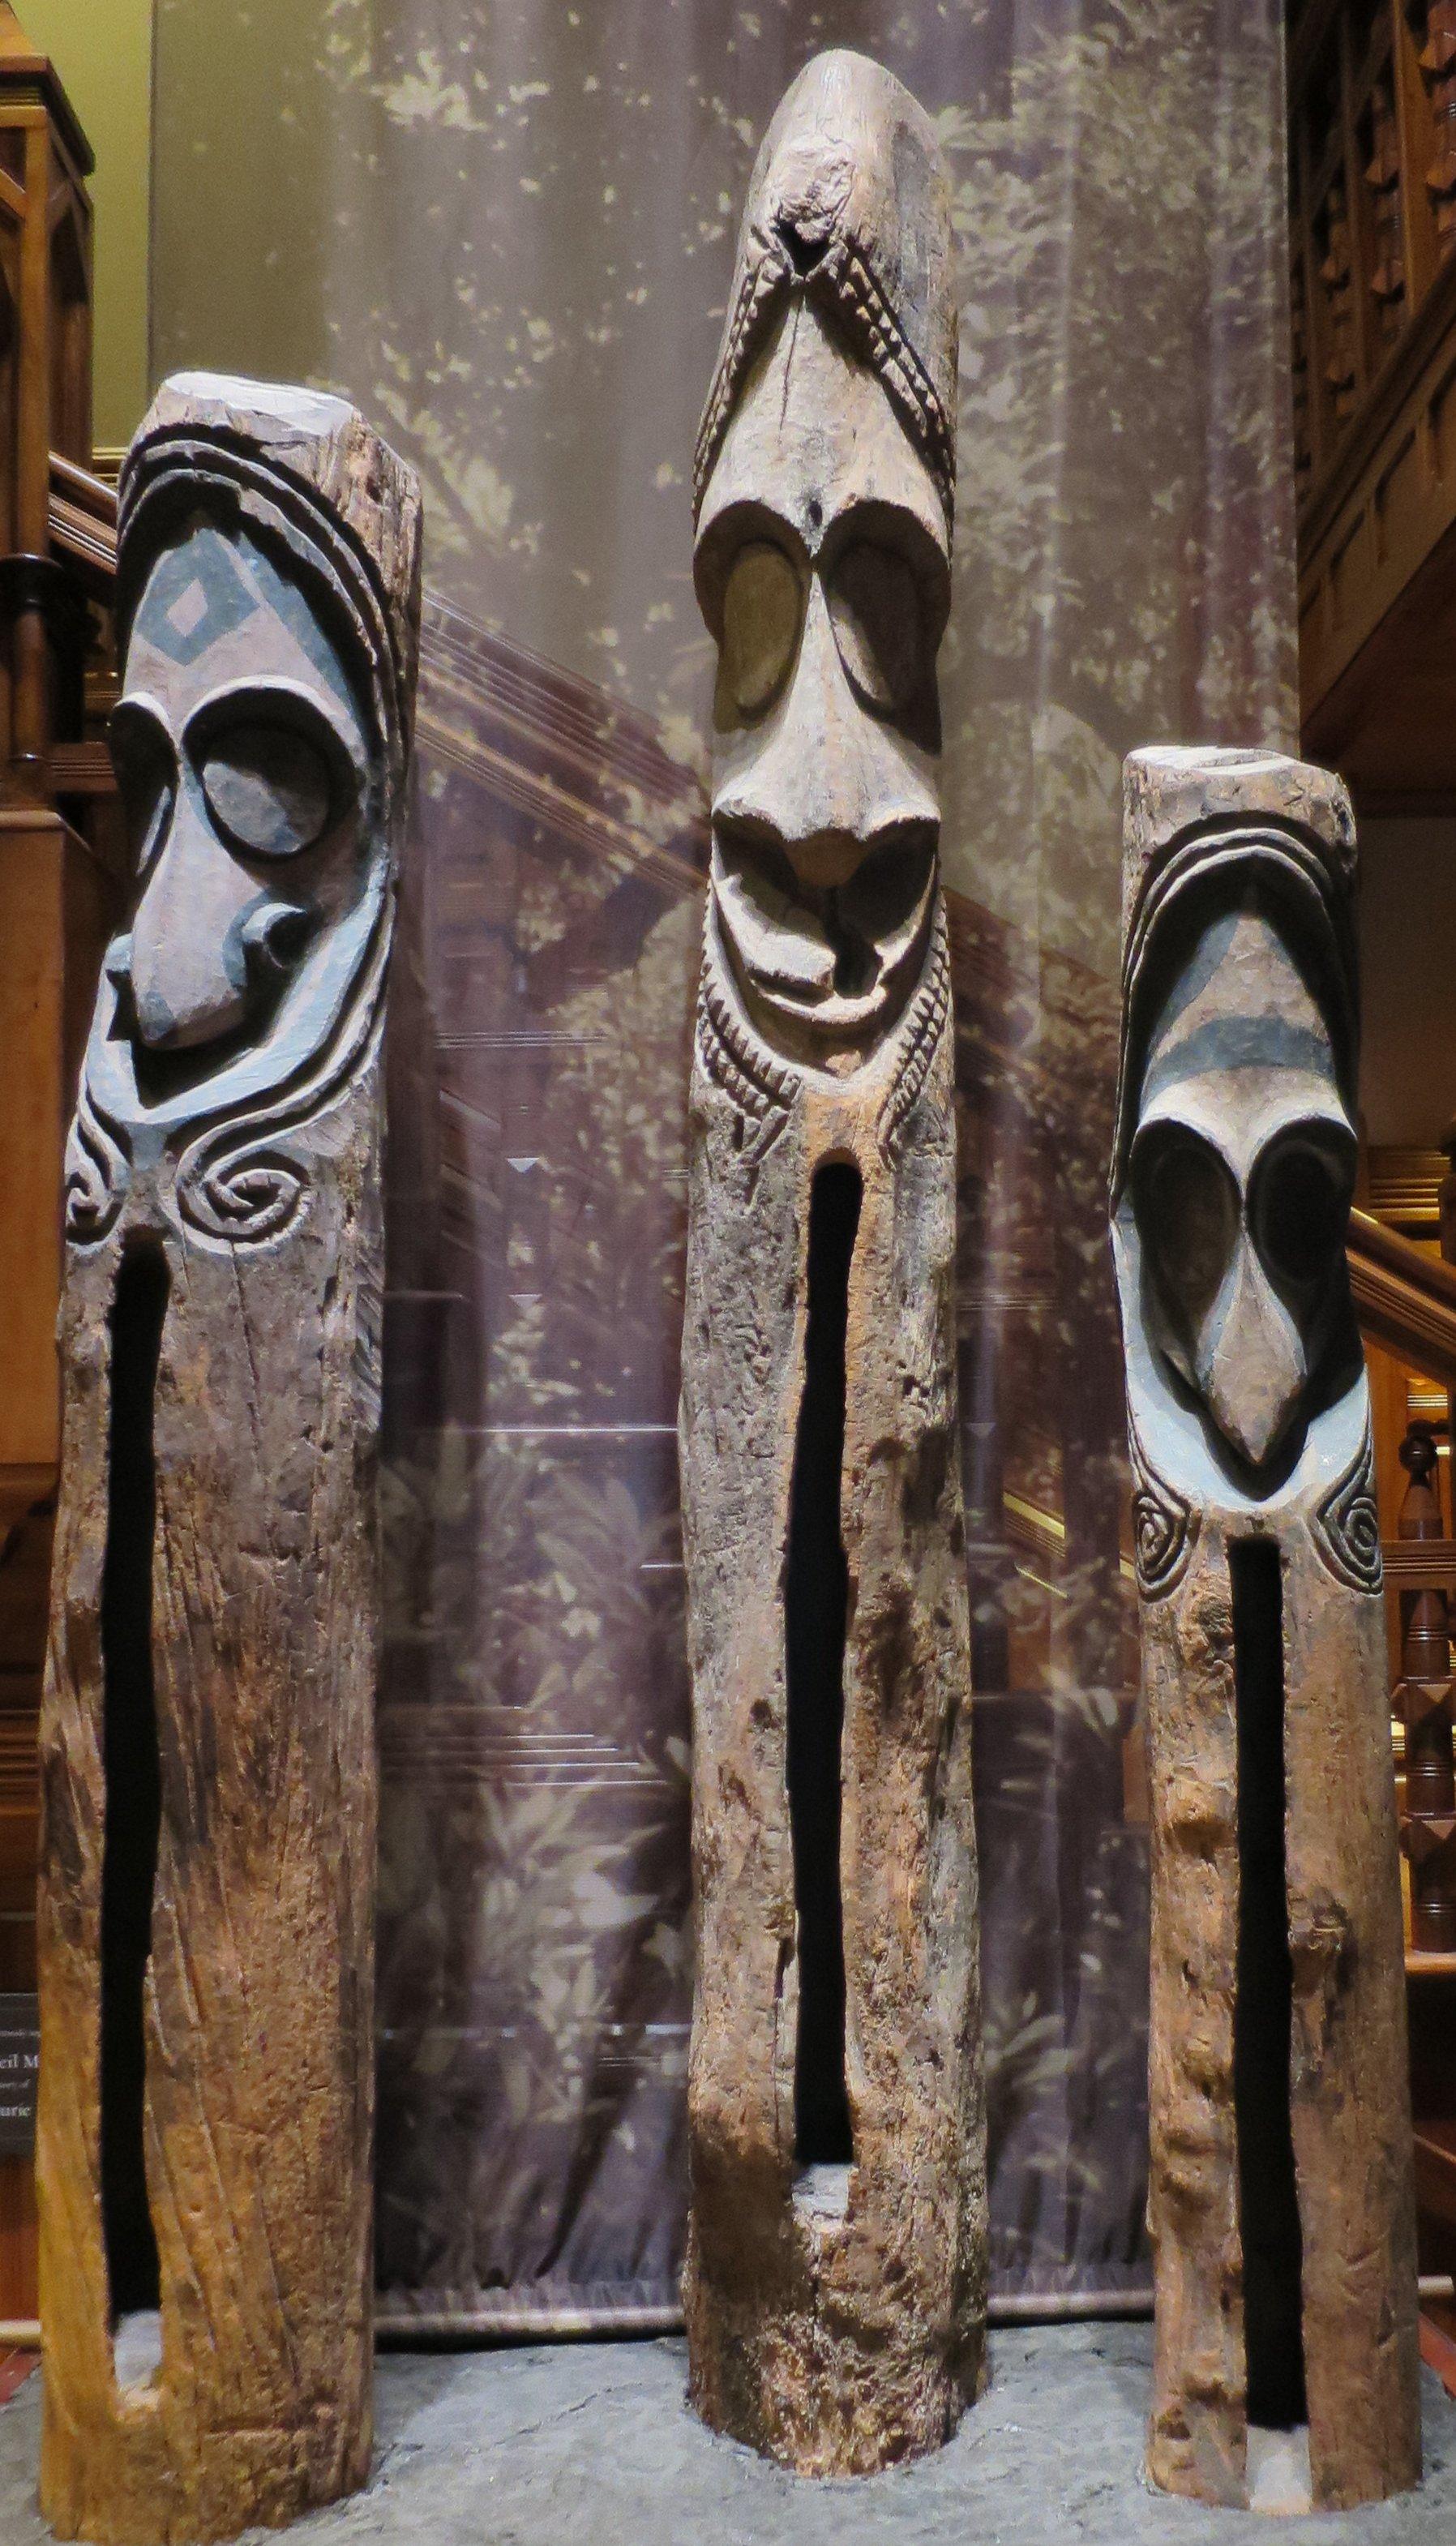 http://upload.wikimedia.org/wikipedia/commons/d/df/Wooden_slit_drums_from_Vanuatu%2C_Bernice_P._Bishop_Museum.JPG